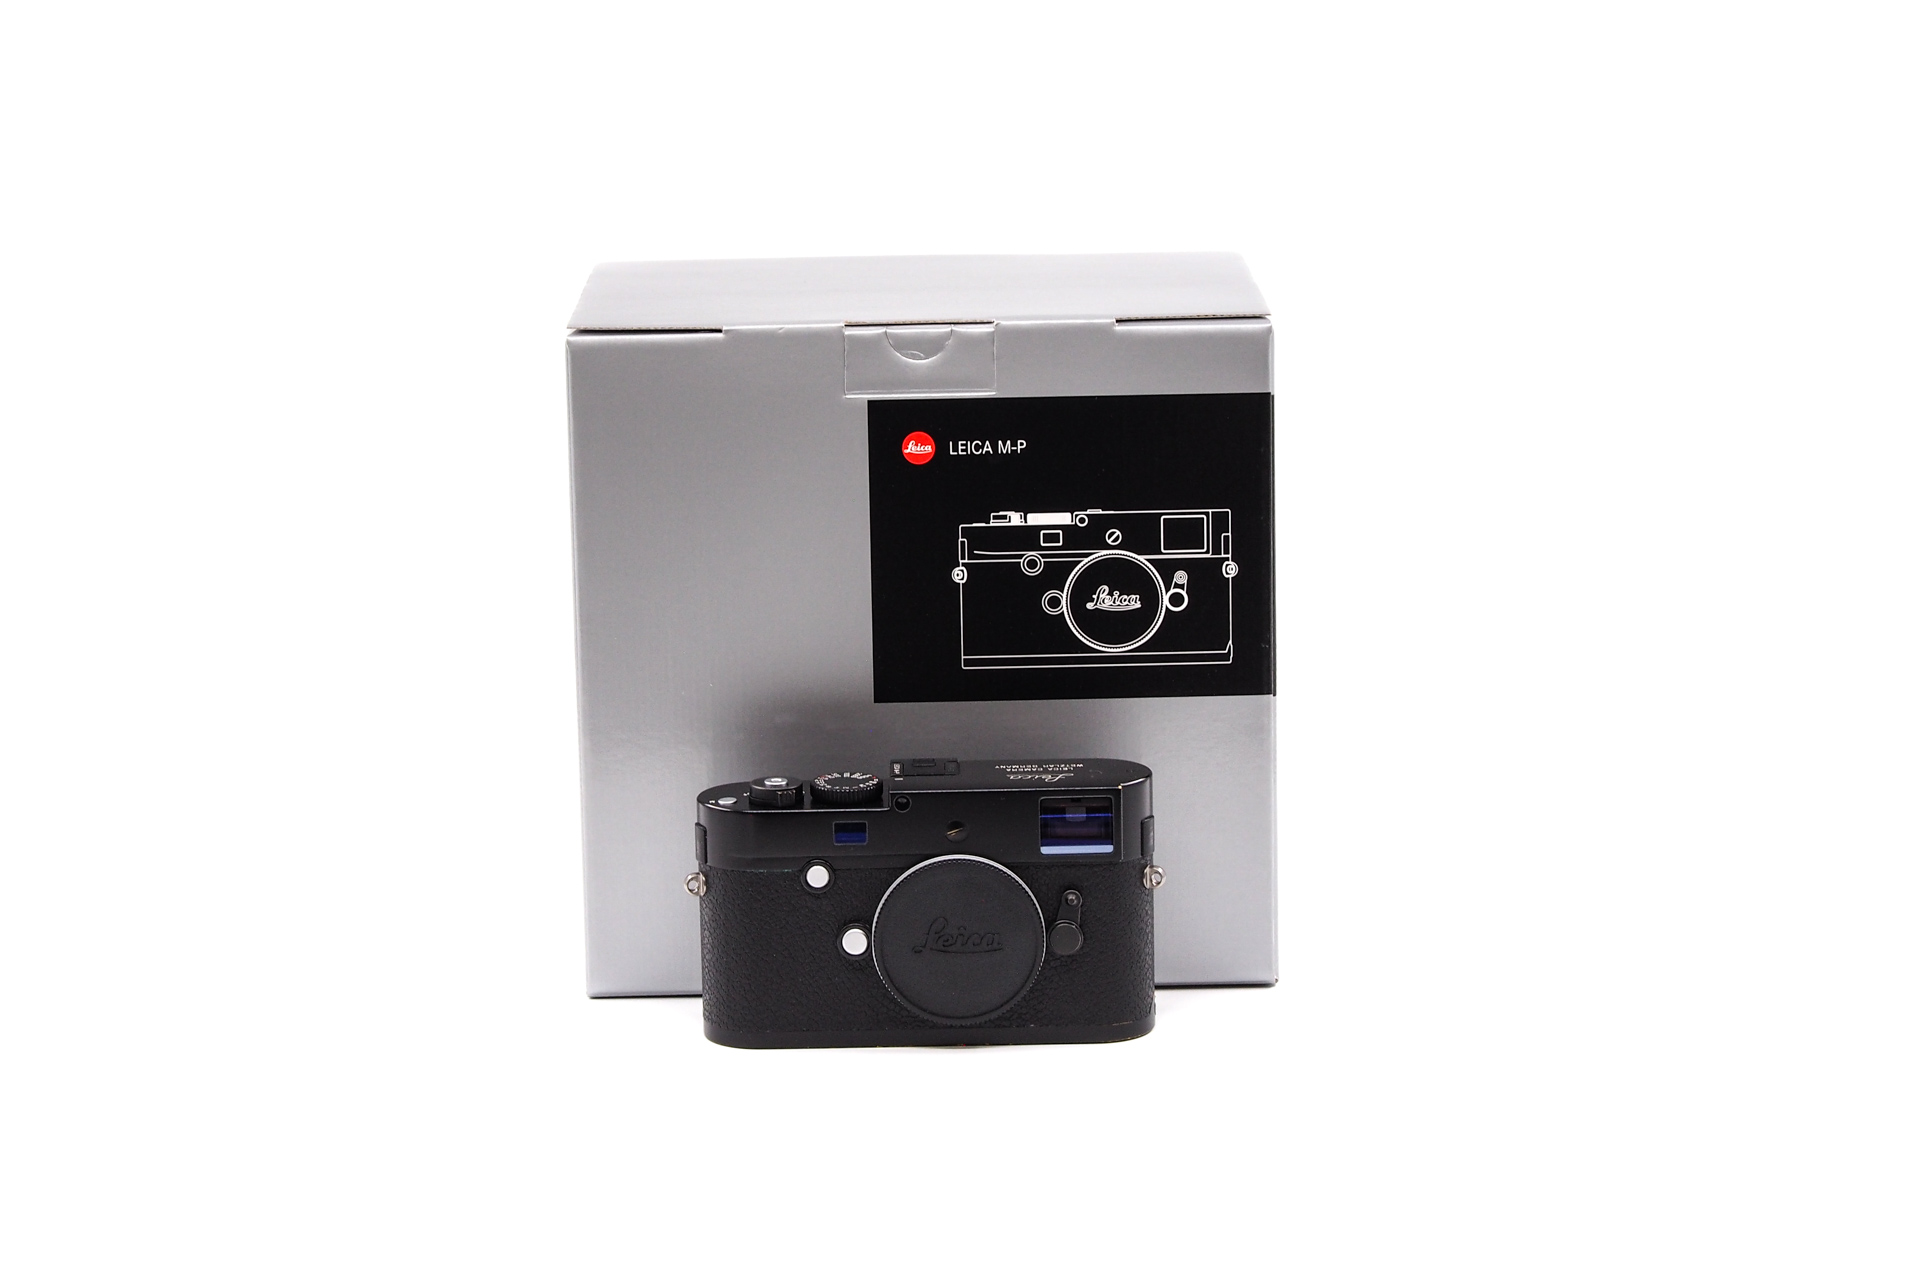 Leica M-P (Typ 240) black